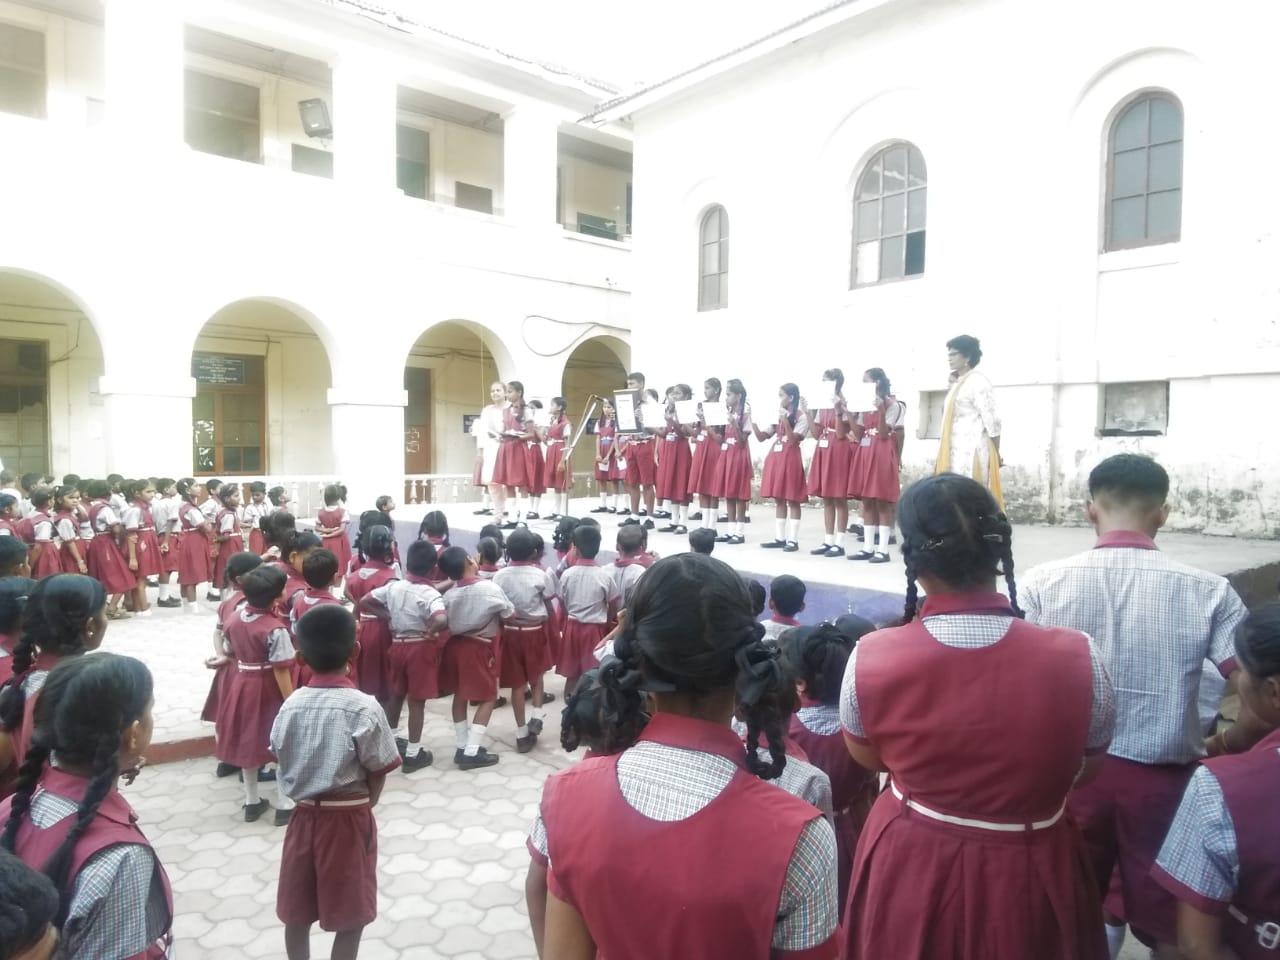 Minicipal School